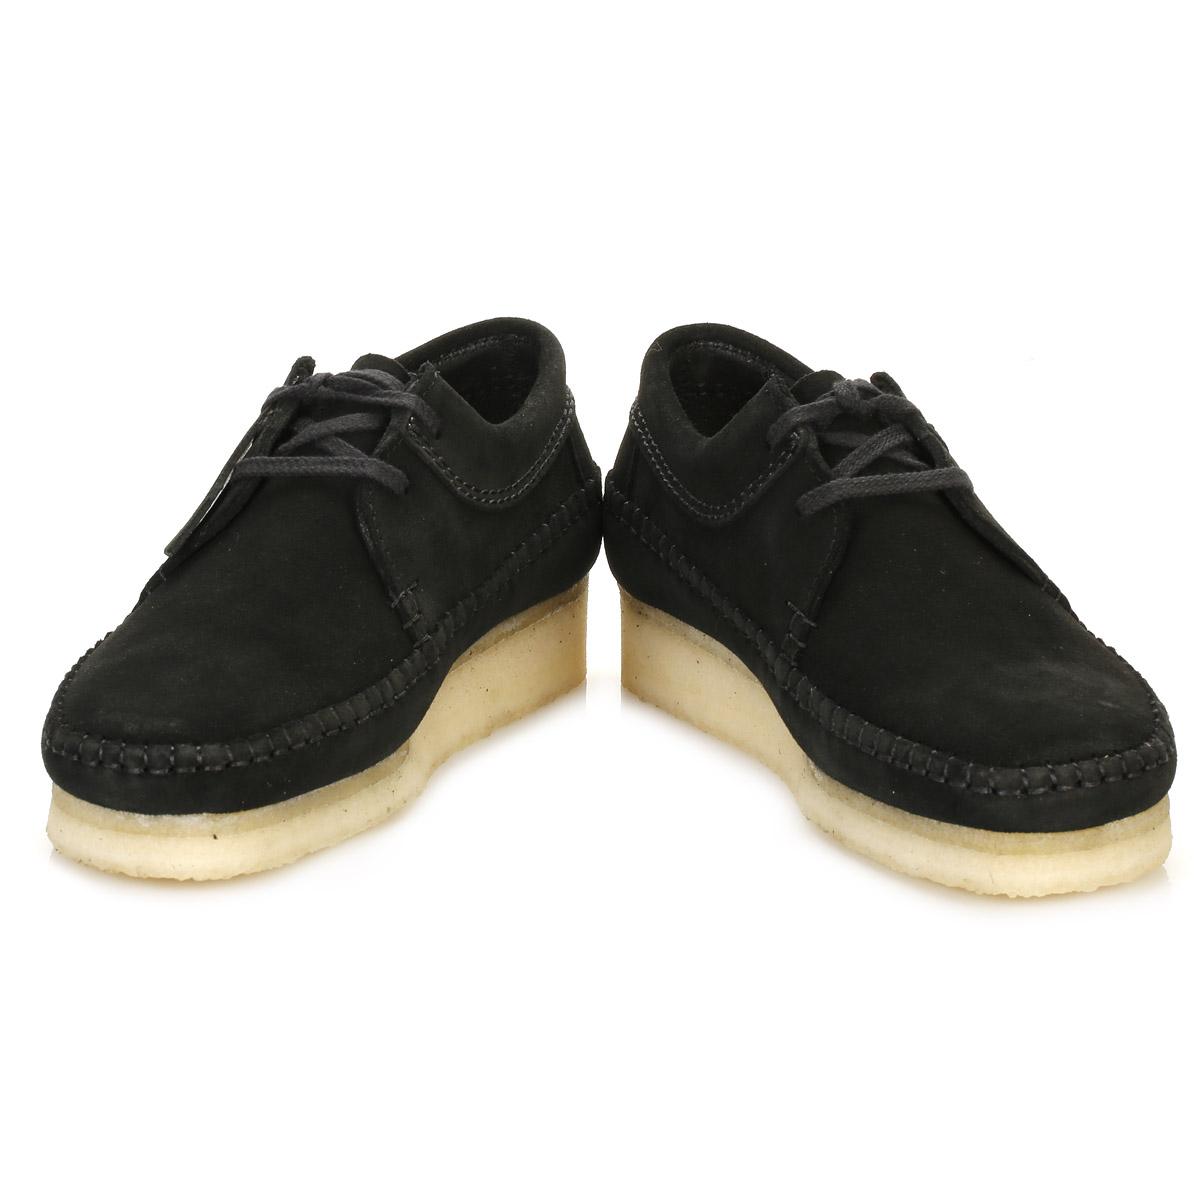 Clarks Men S Casual Lace Up Shoes